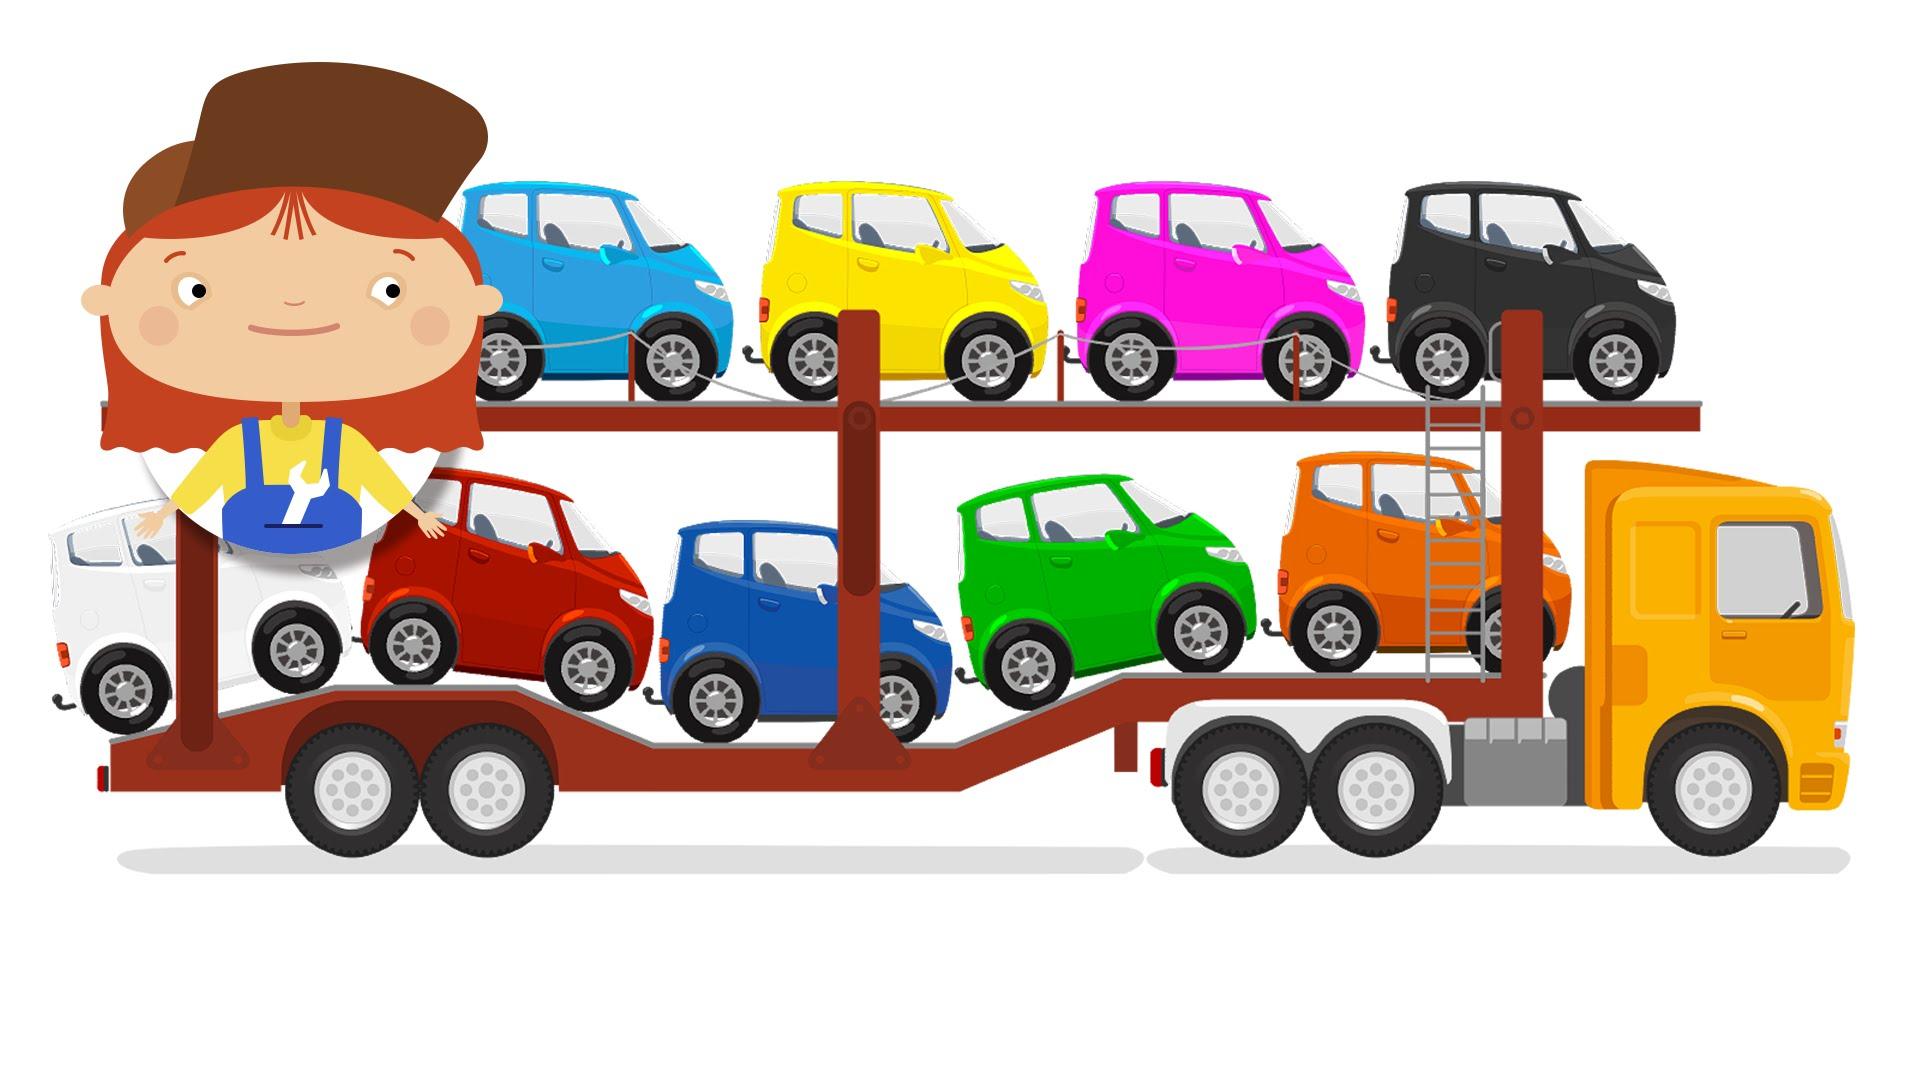 Cars clipart transporter. Kids cartoon car and